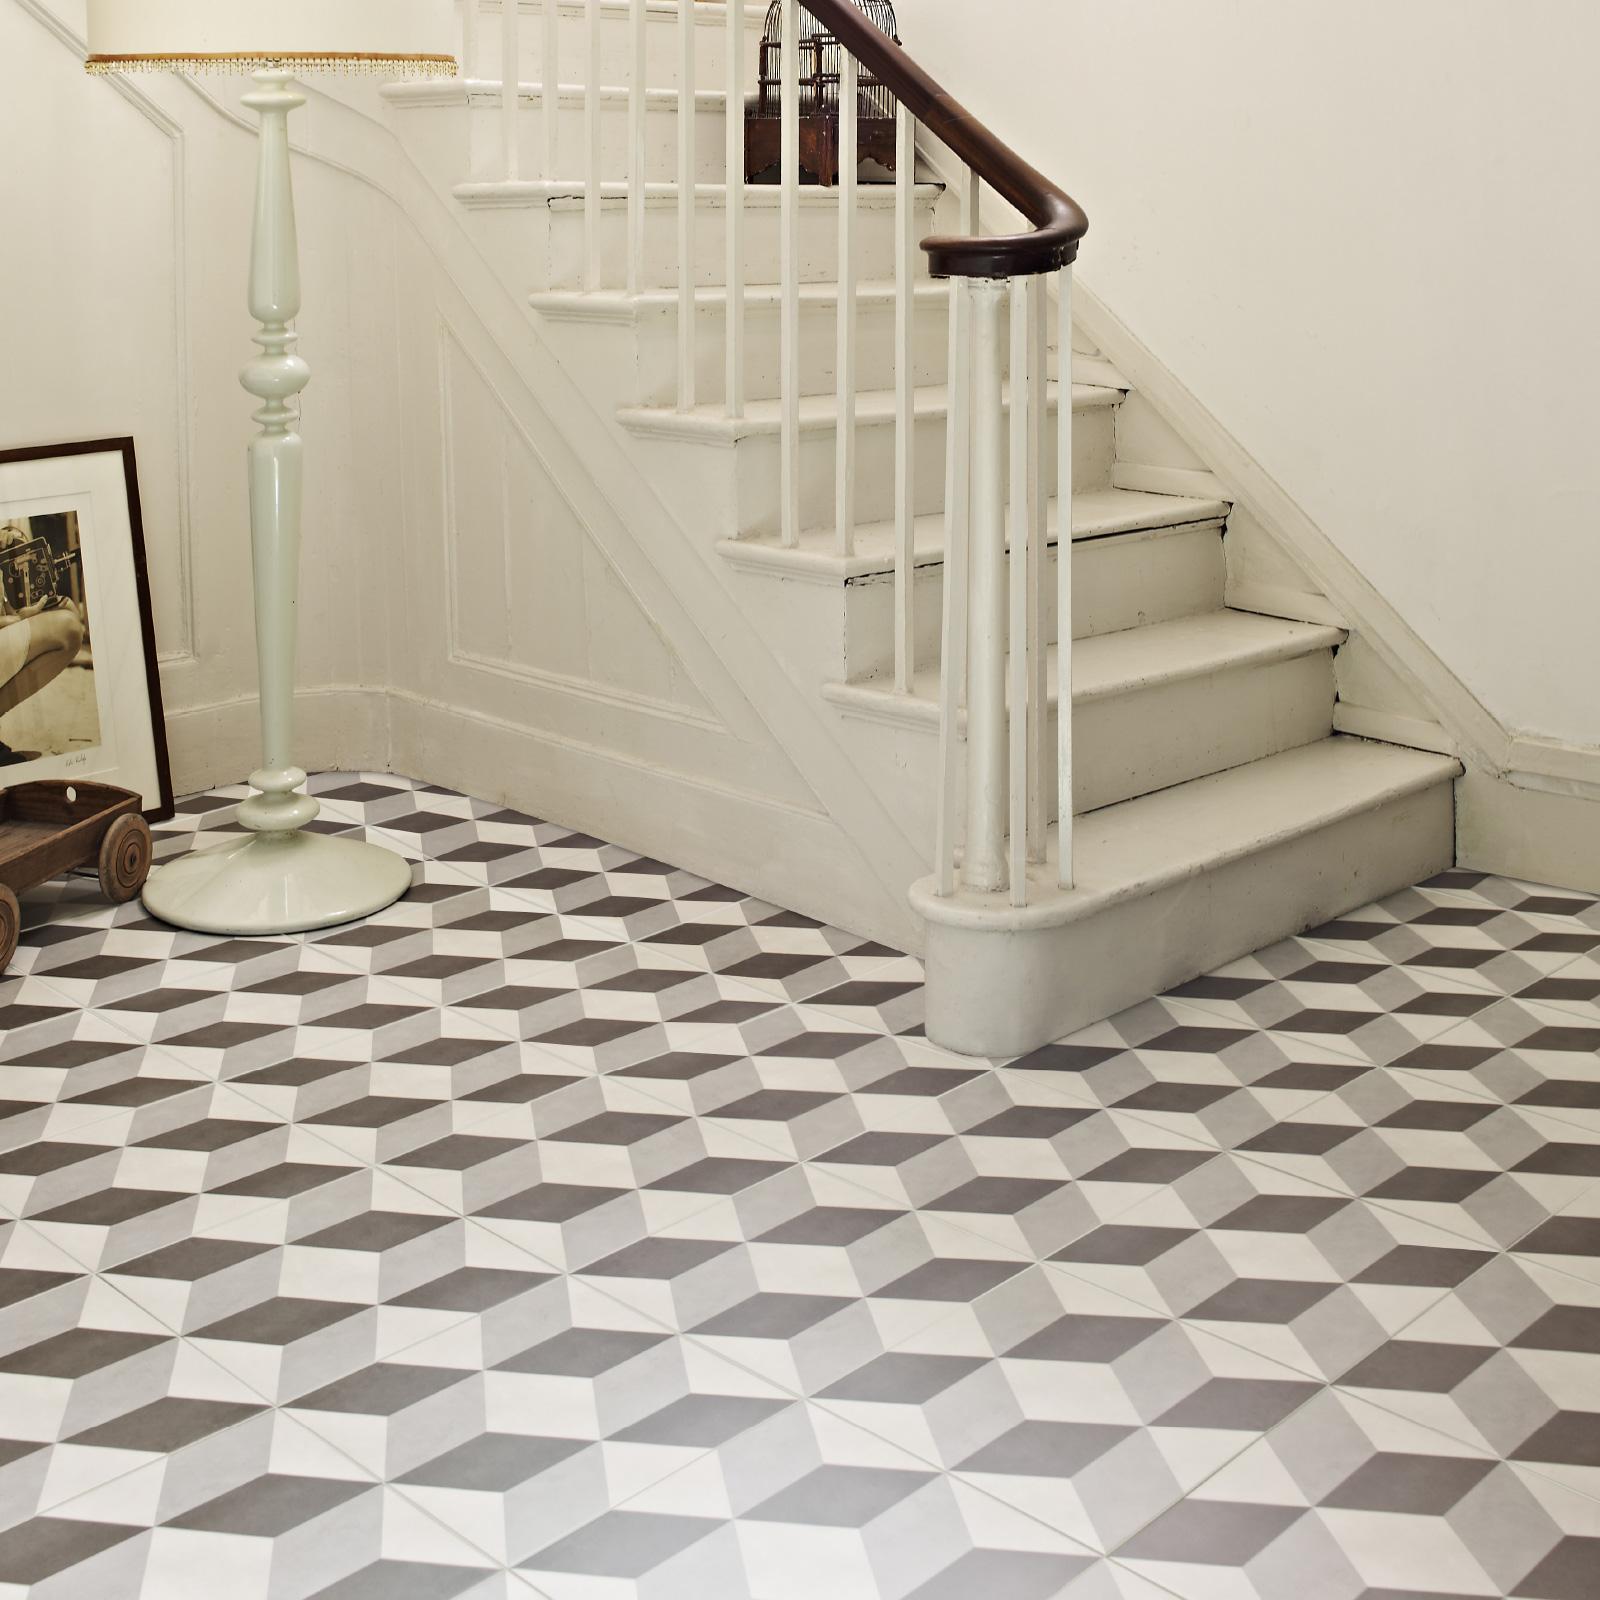 Flooring tiles from the HD tile ranges